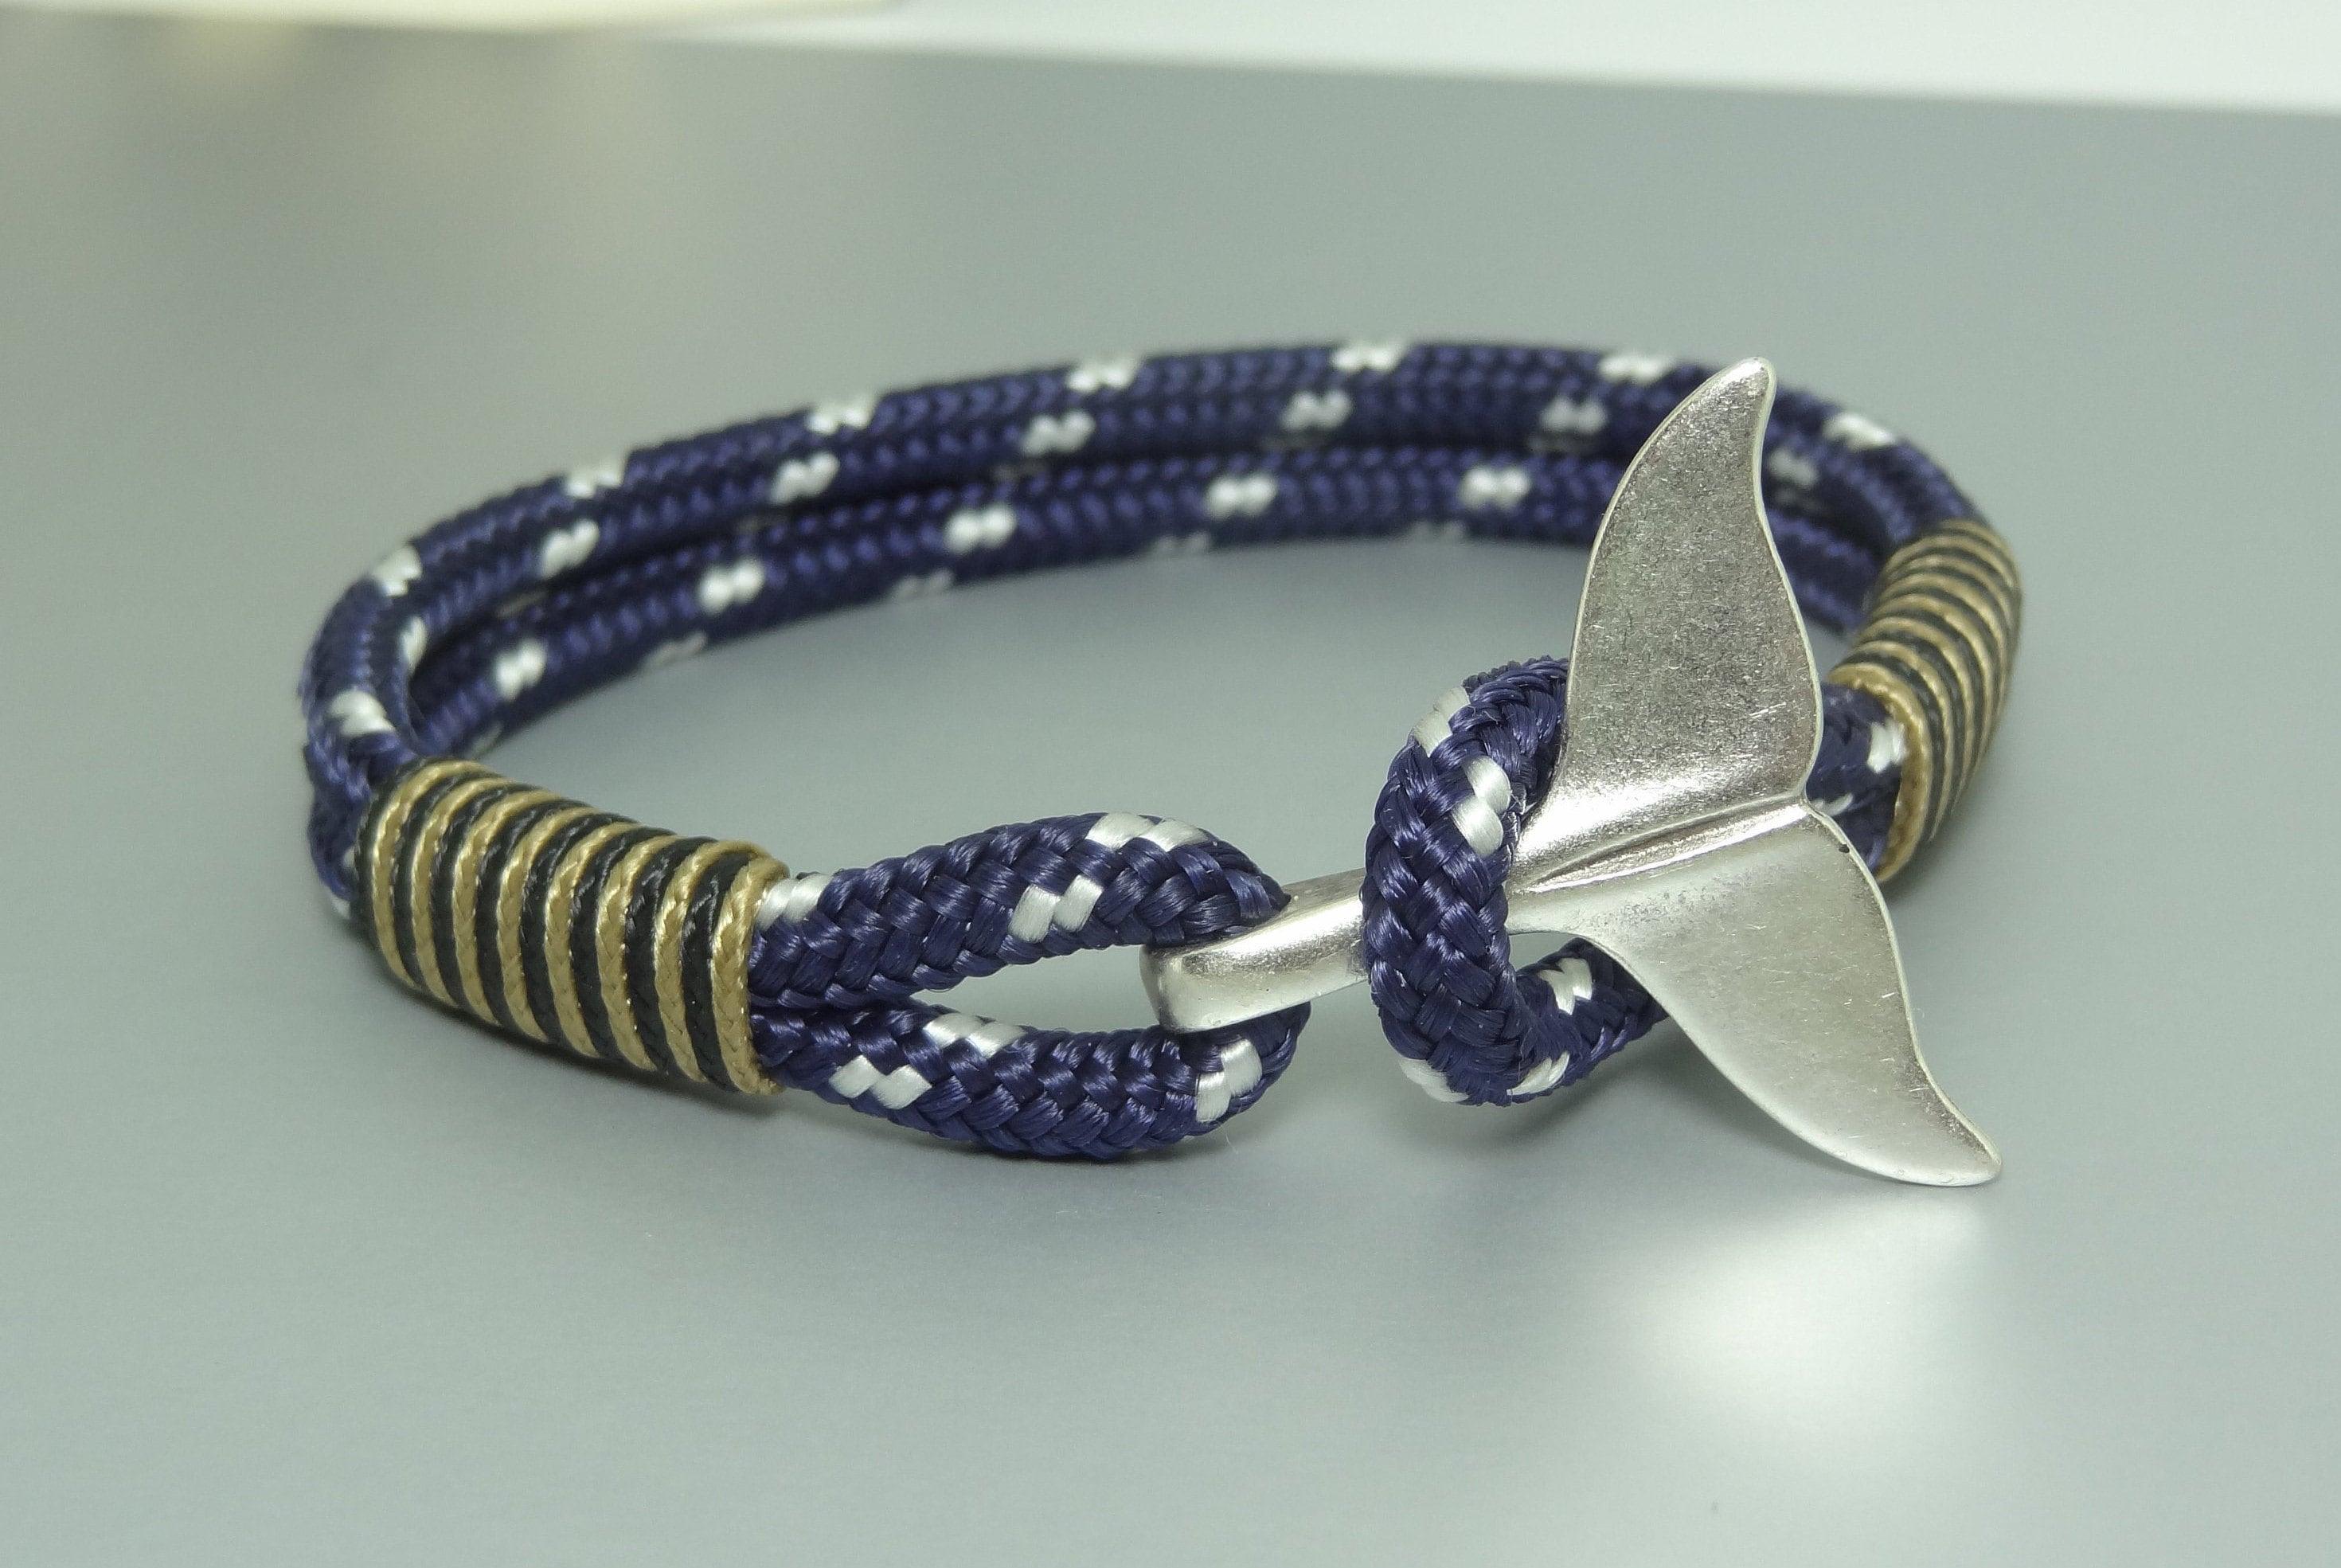 Wal Schwanz Armband Herren Seil Armband blaue Paracord | Etsy